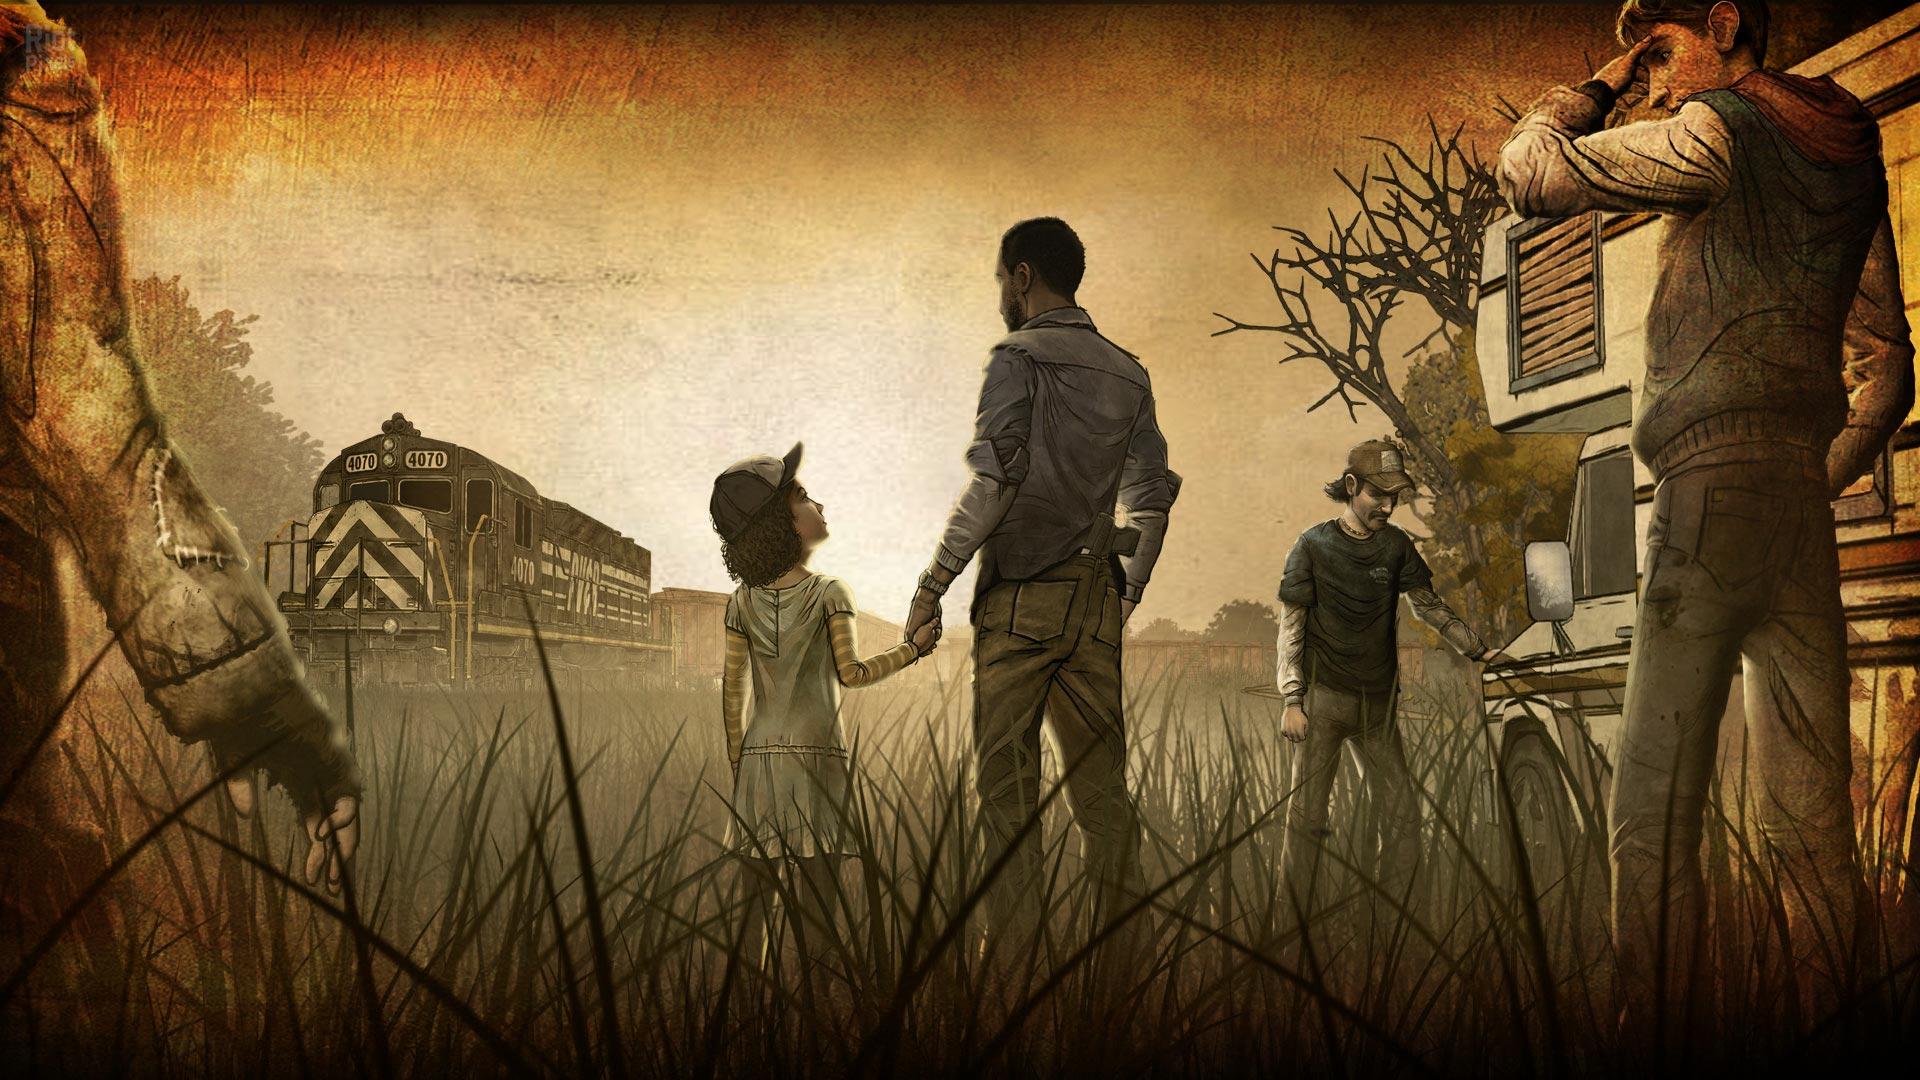 Walking Dead Game Wallpapers 1920x1080